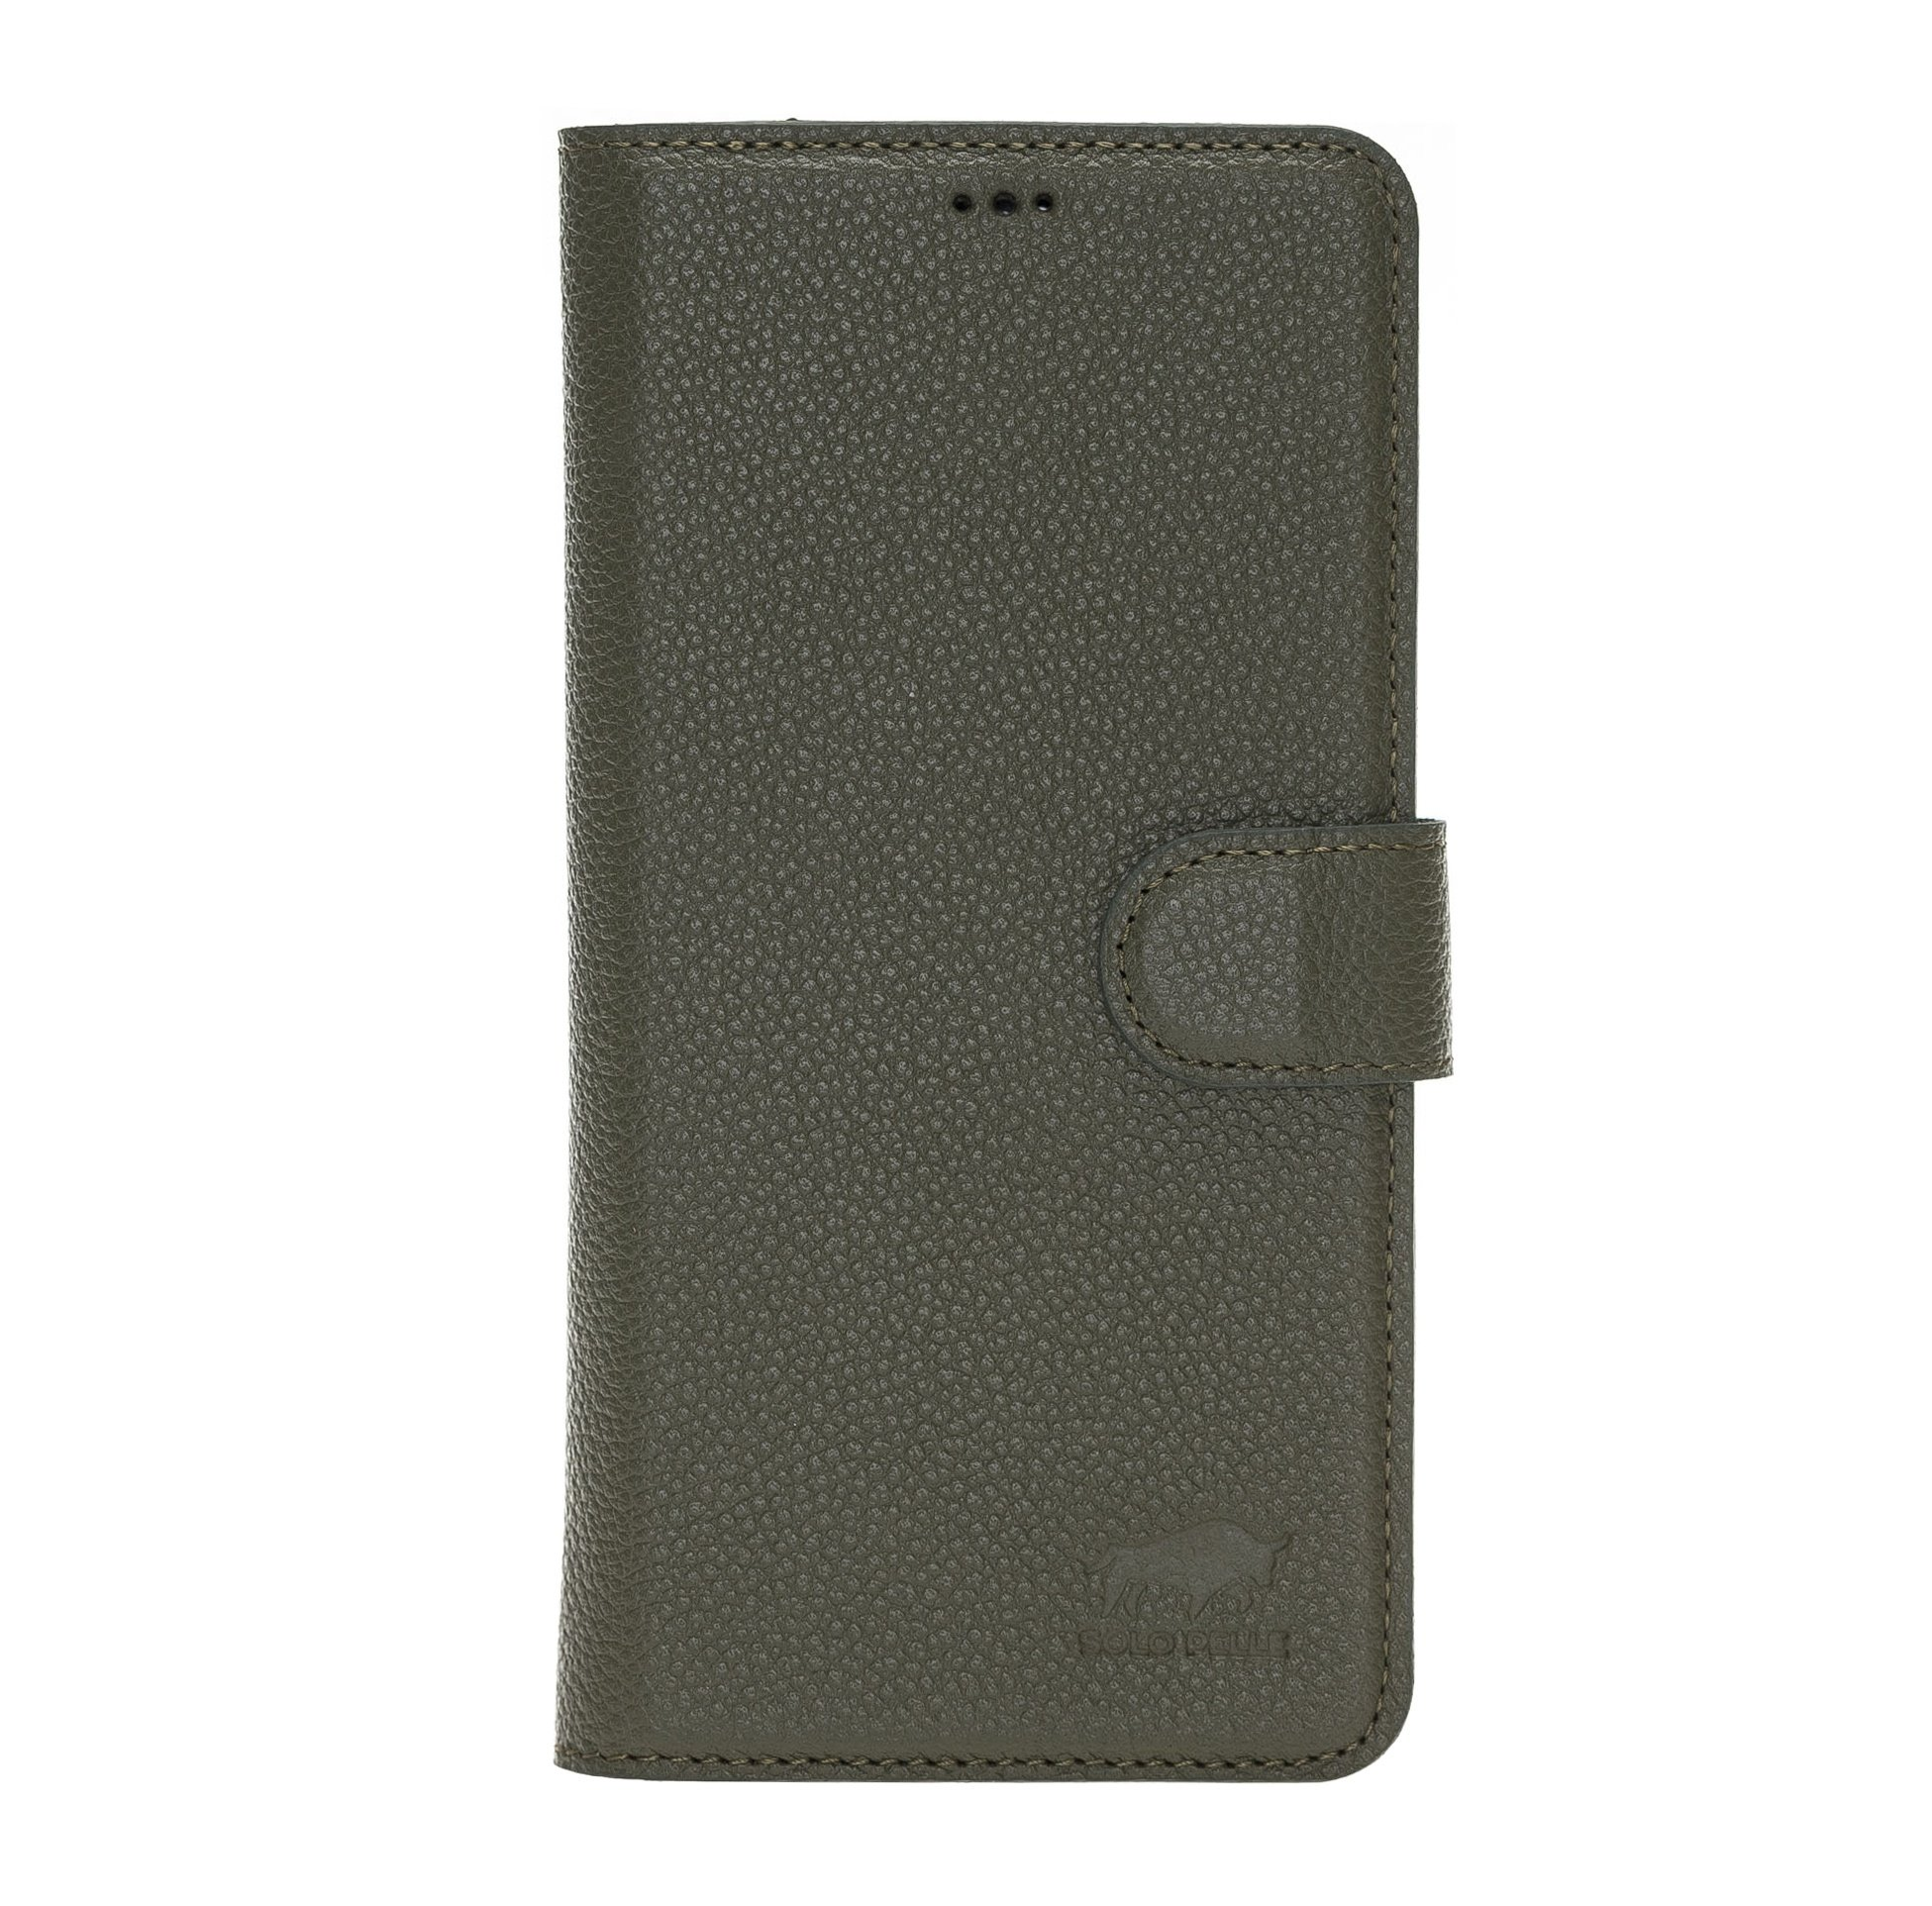 Solo Pelle Lederhülle kompatibel für iPhone 11 Pro Max 6.5 Zoll abnehmbare Hülle (2in1) (Nachtgrün)